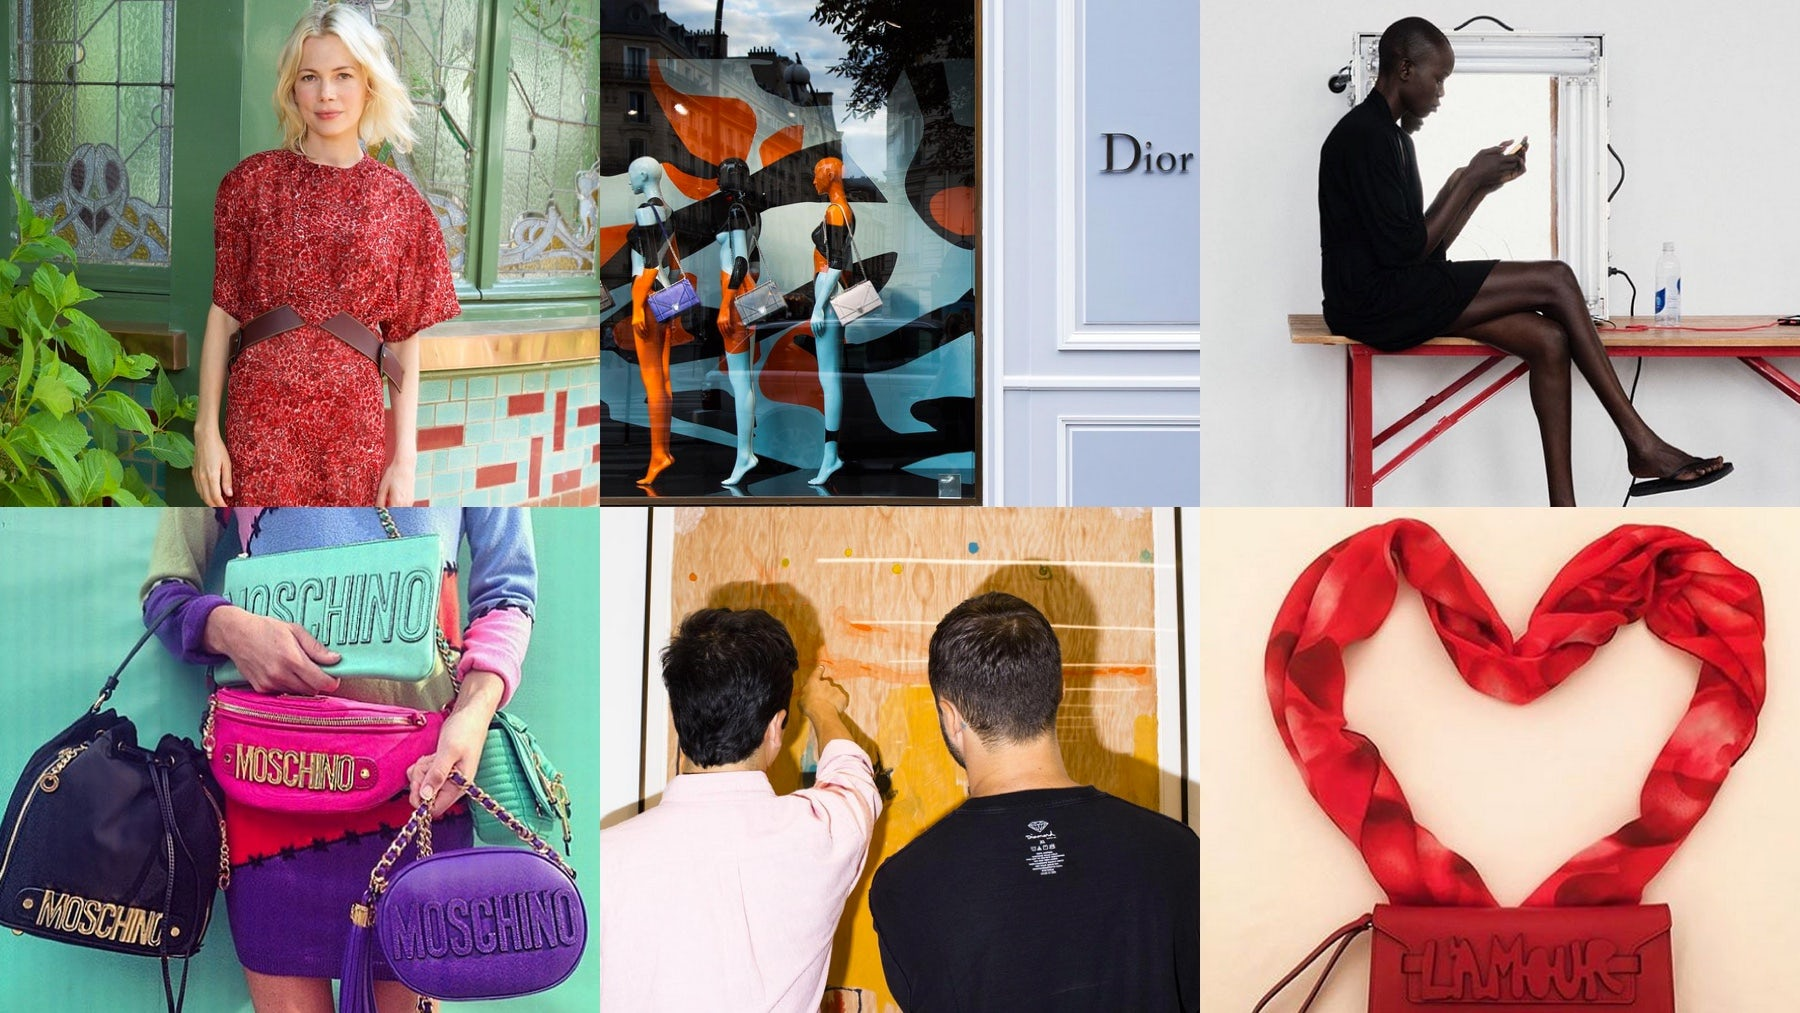 Instagram posts by (clockwise) Louis Vuitton; Dior; Misha Nonoo; Valentino; Proenza Schouler; Moschino   Source: Instagram